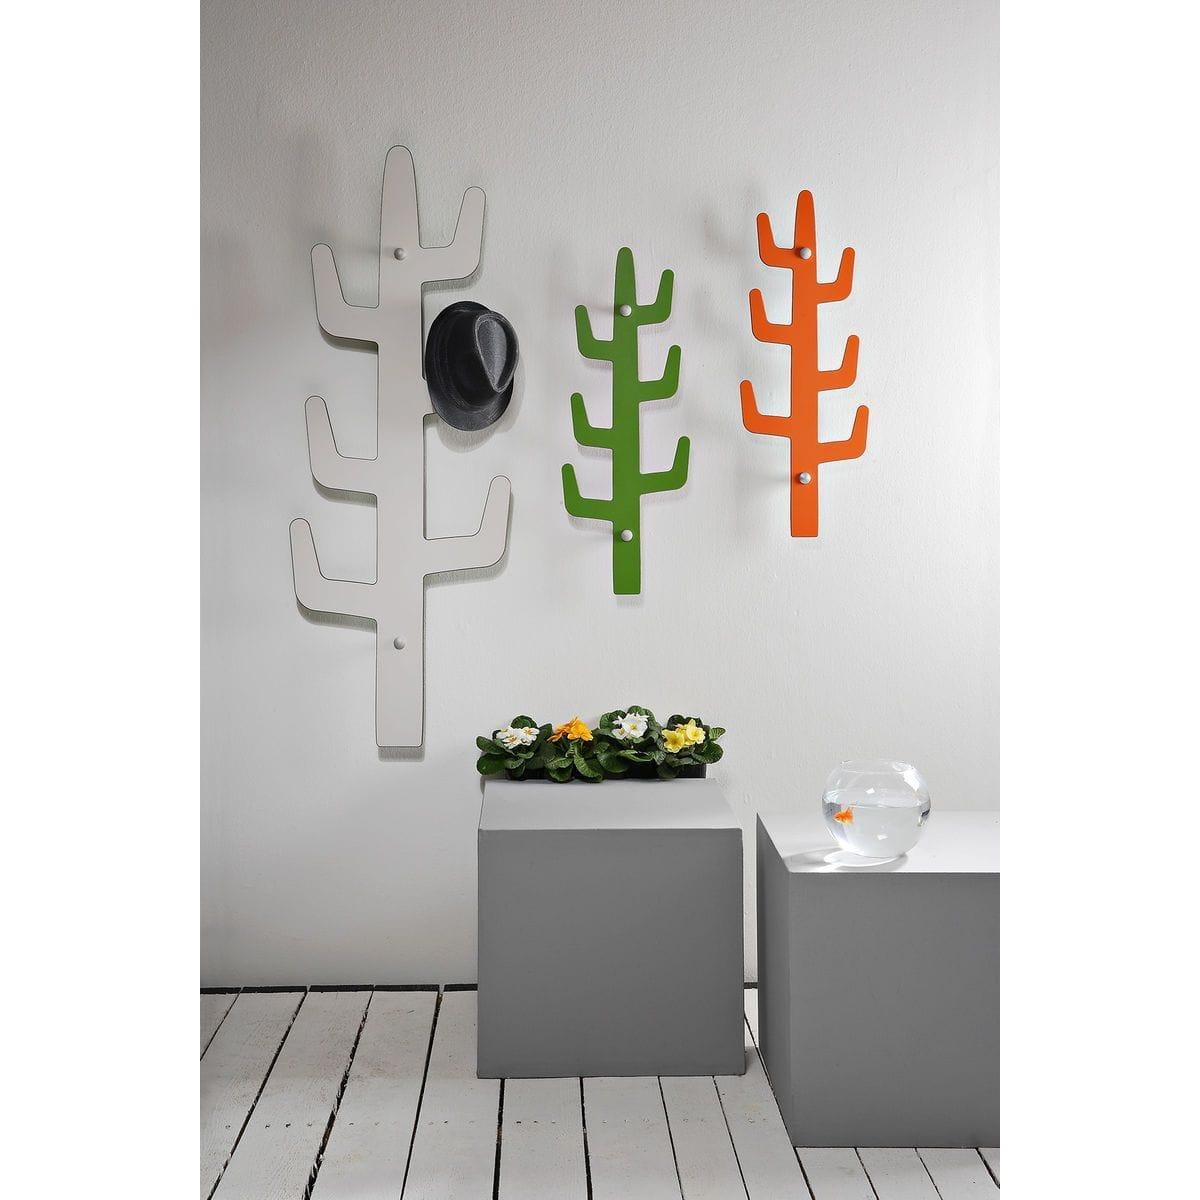 appendiabiti da parete minimal a forma di saguaro in due misure diverse